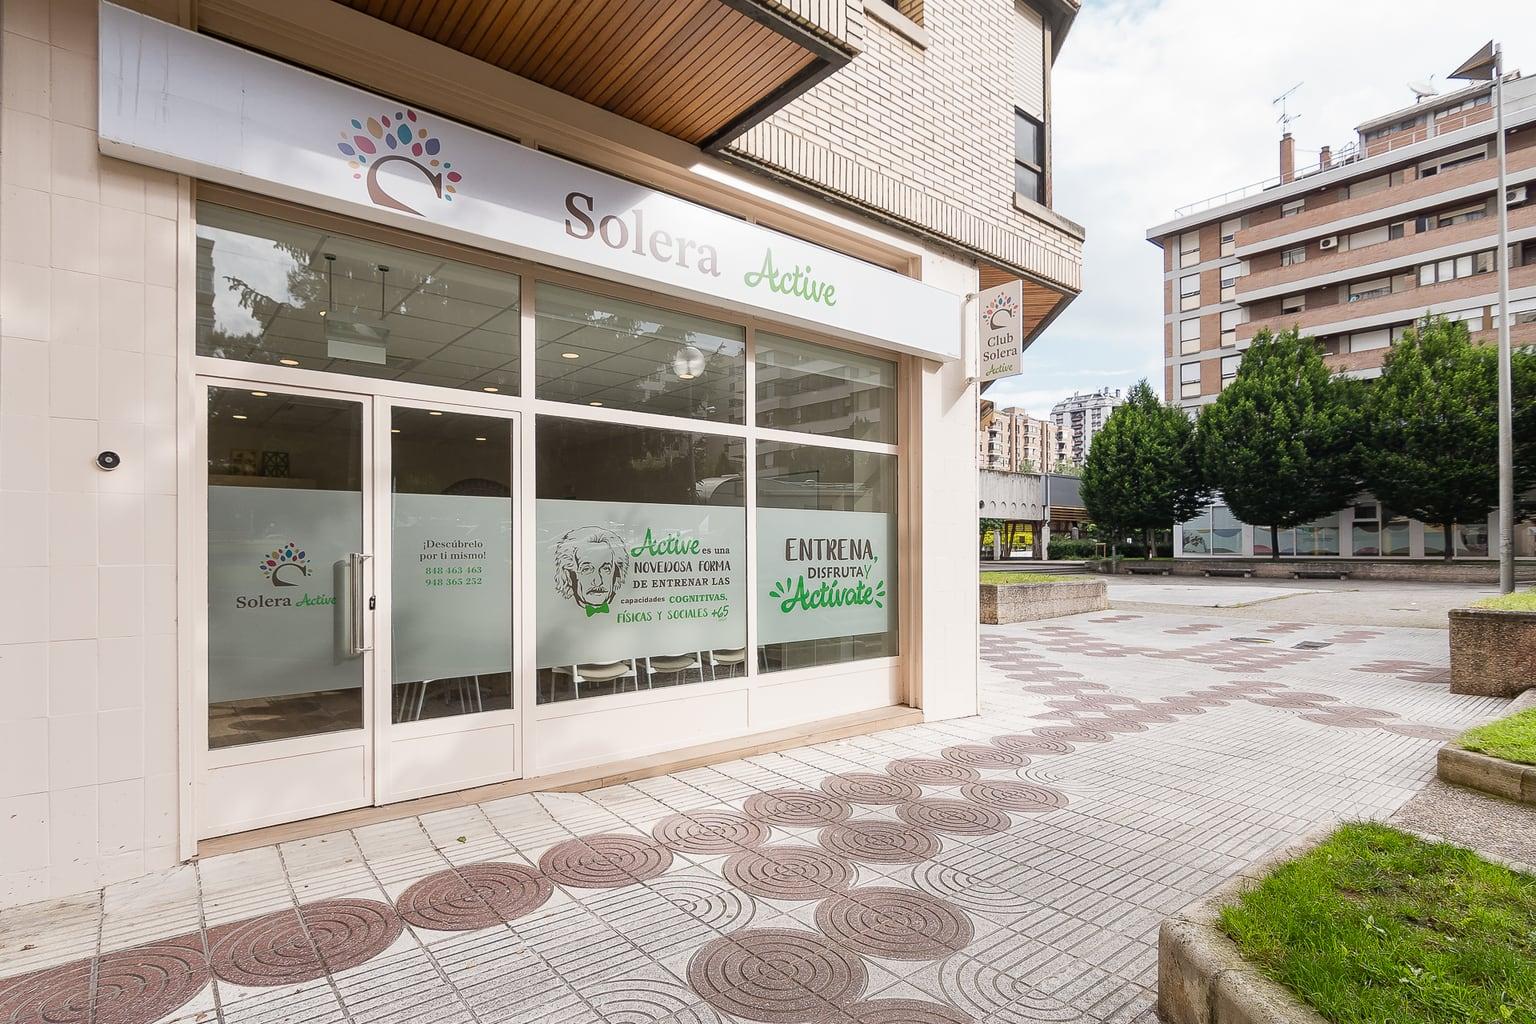 Solera Active Iturrama 1 (2)